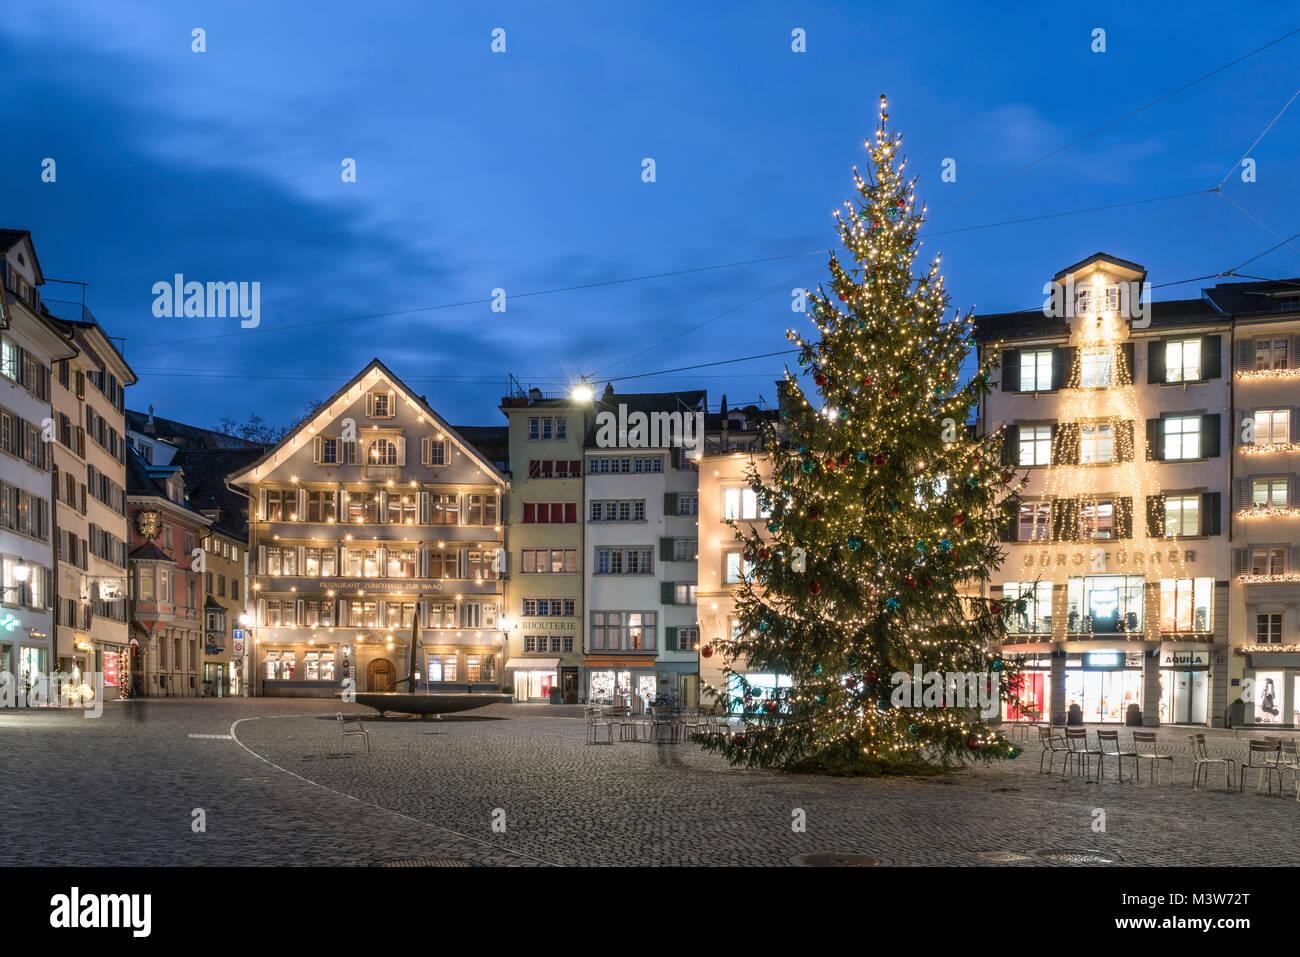 Munster square, Muensterhof, christmas tree, old city center, Zurich, Switzerland - Stock Image